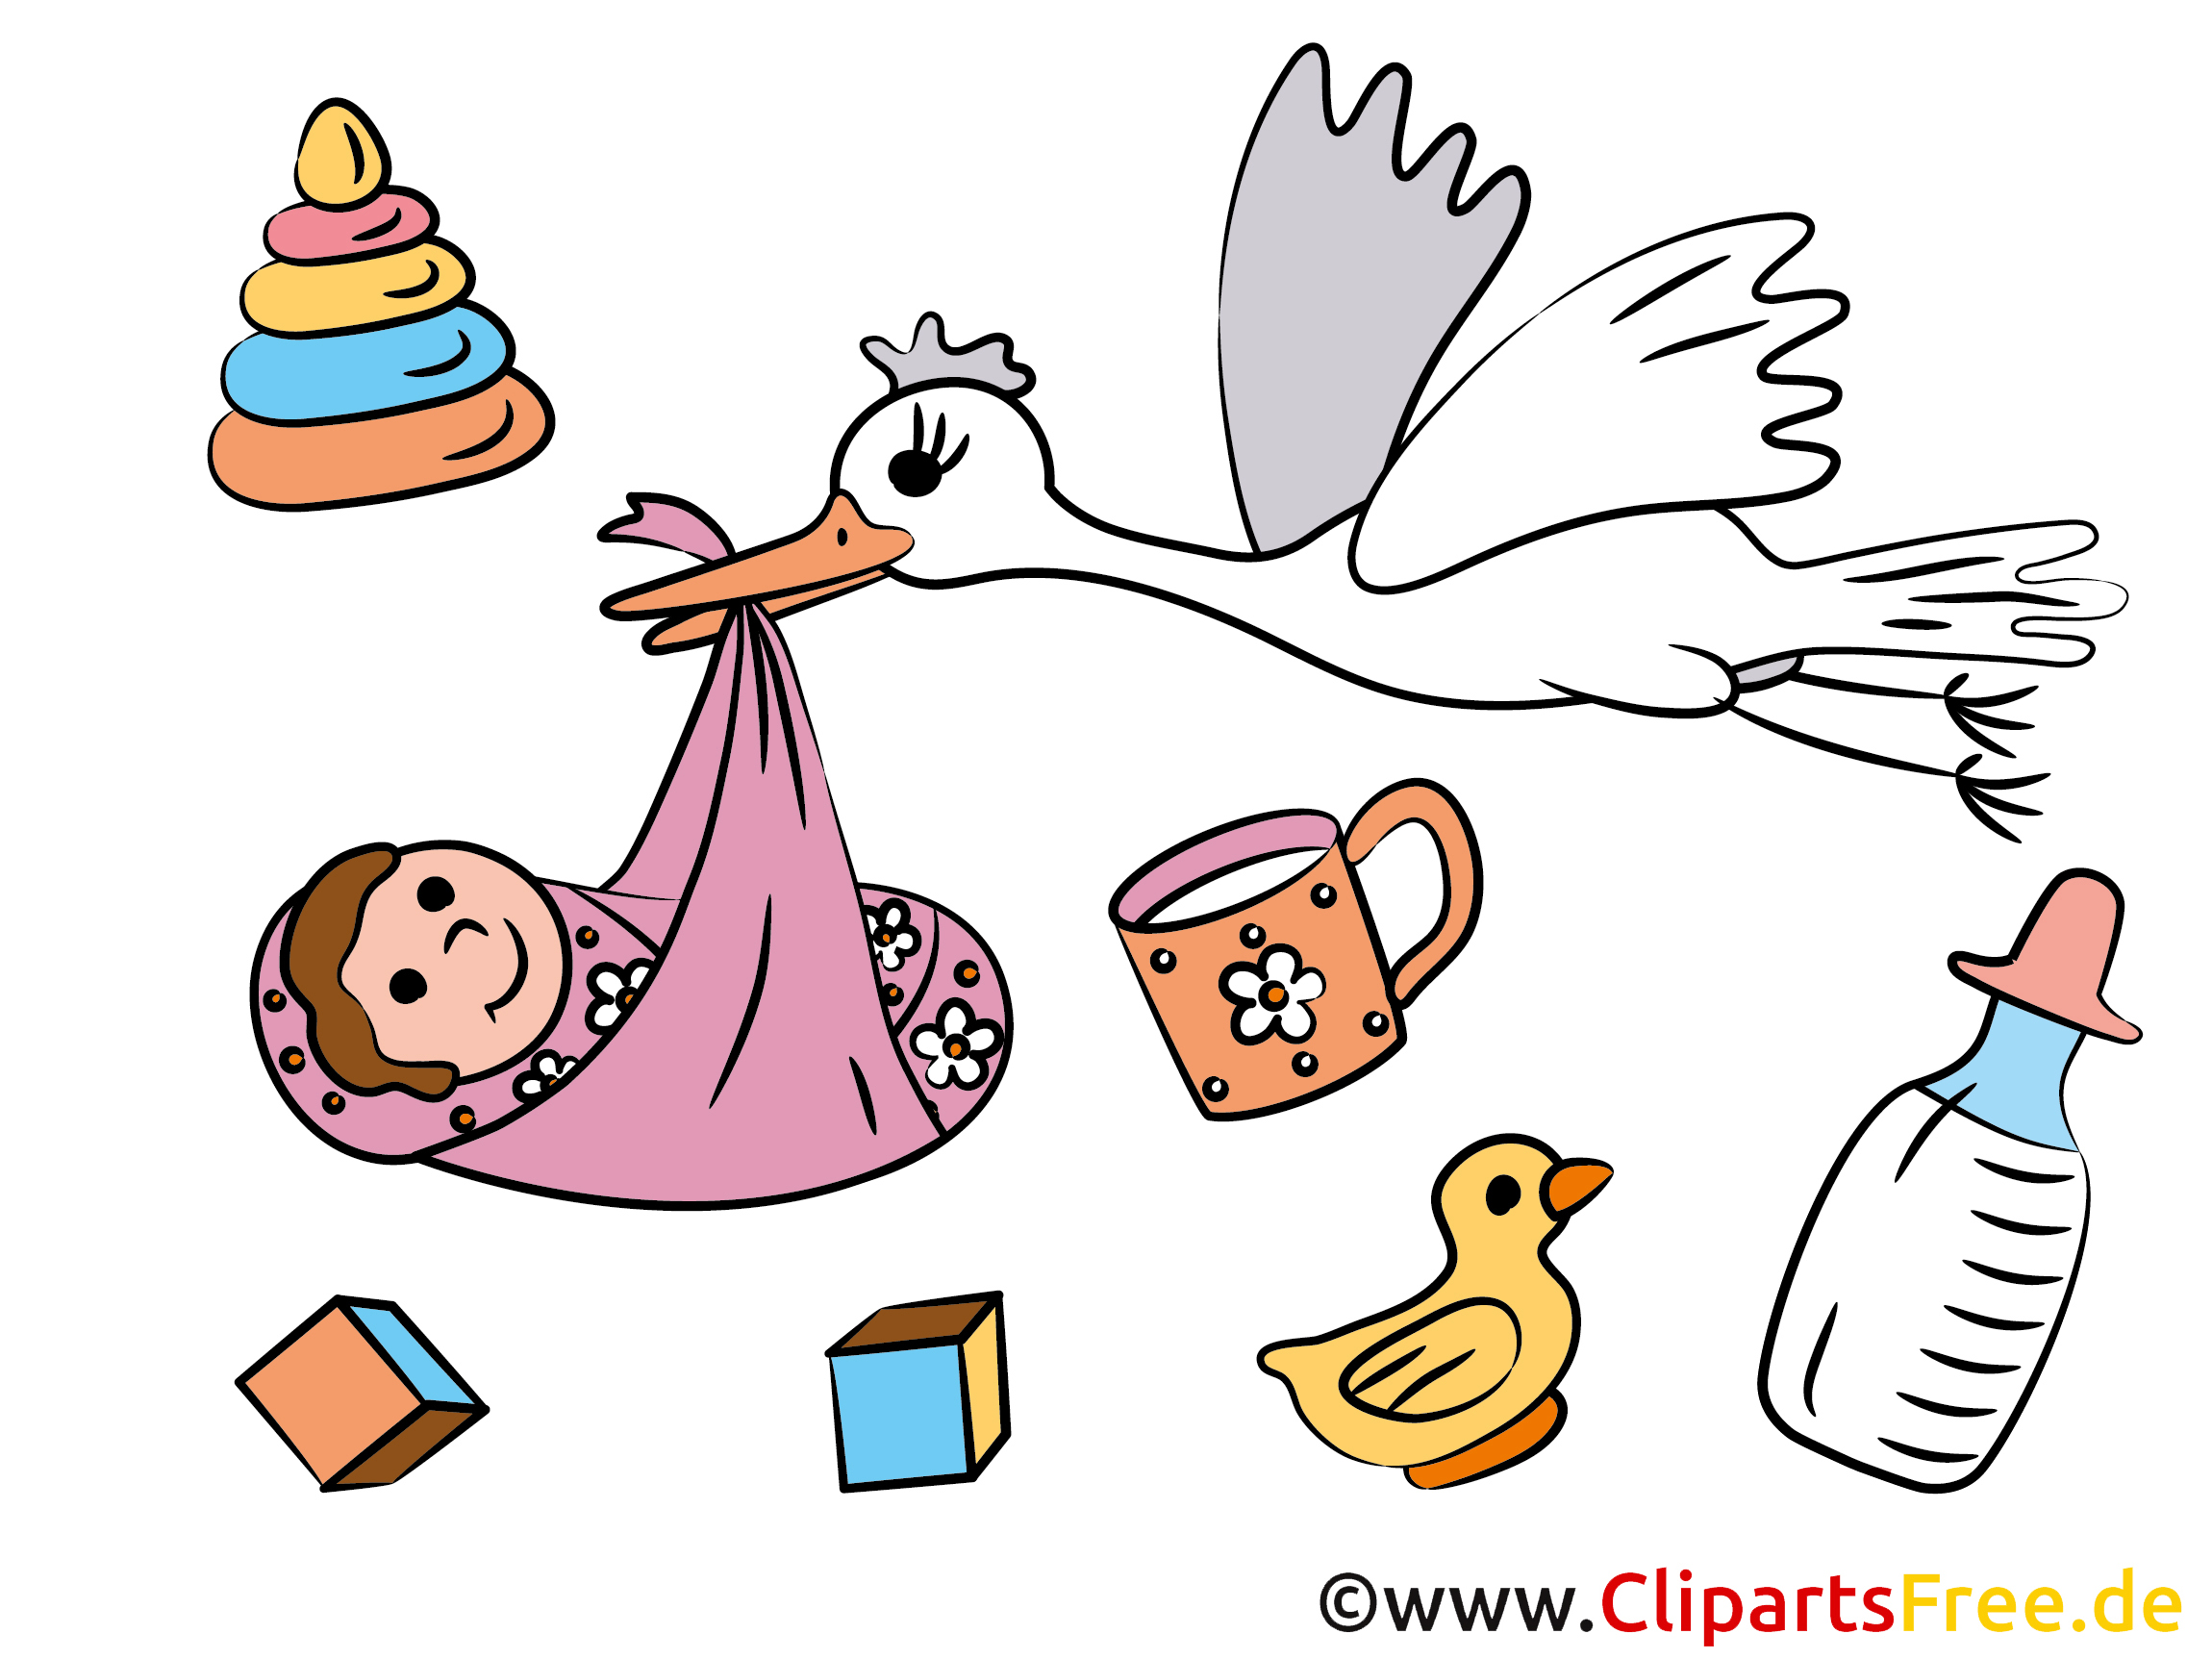 clipart bilder galerie baby gratis schwangerschaft karten